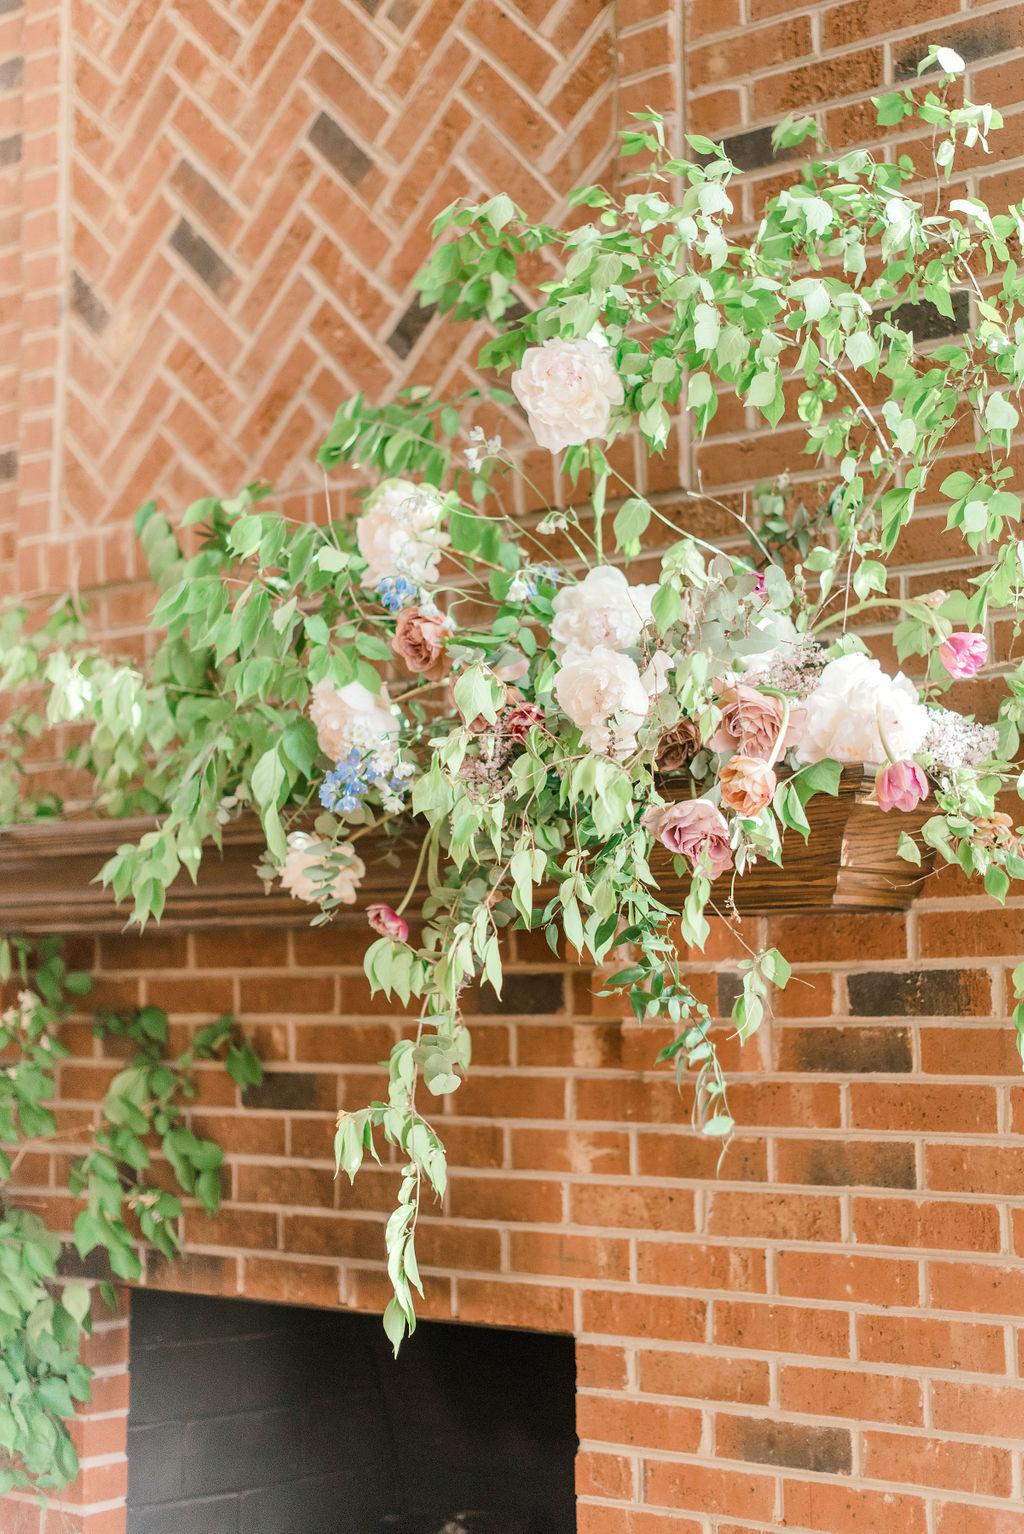 dayton-wedding-planner-fireplace-floral-installation-samantha-joy-events